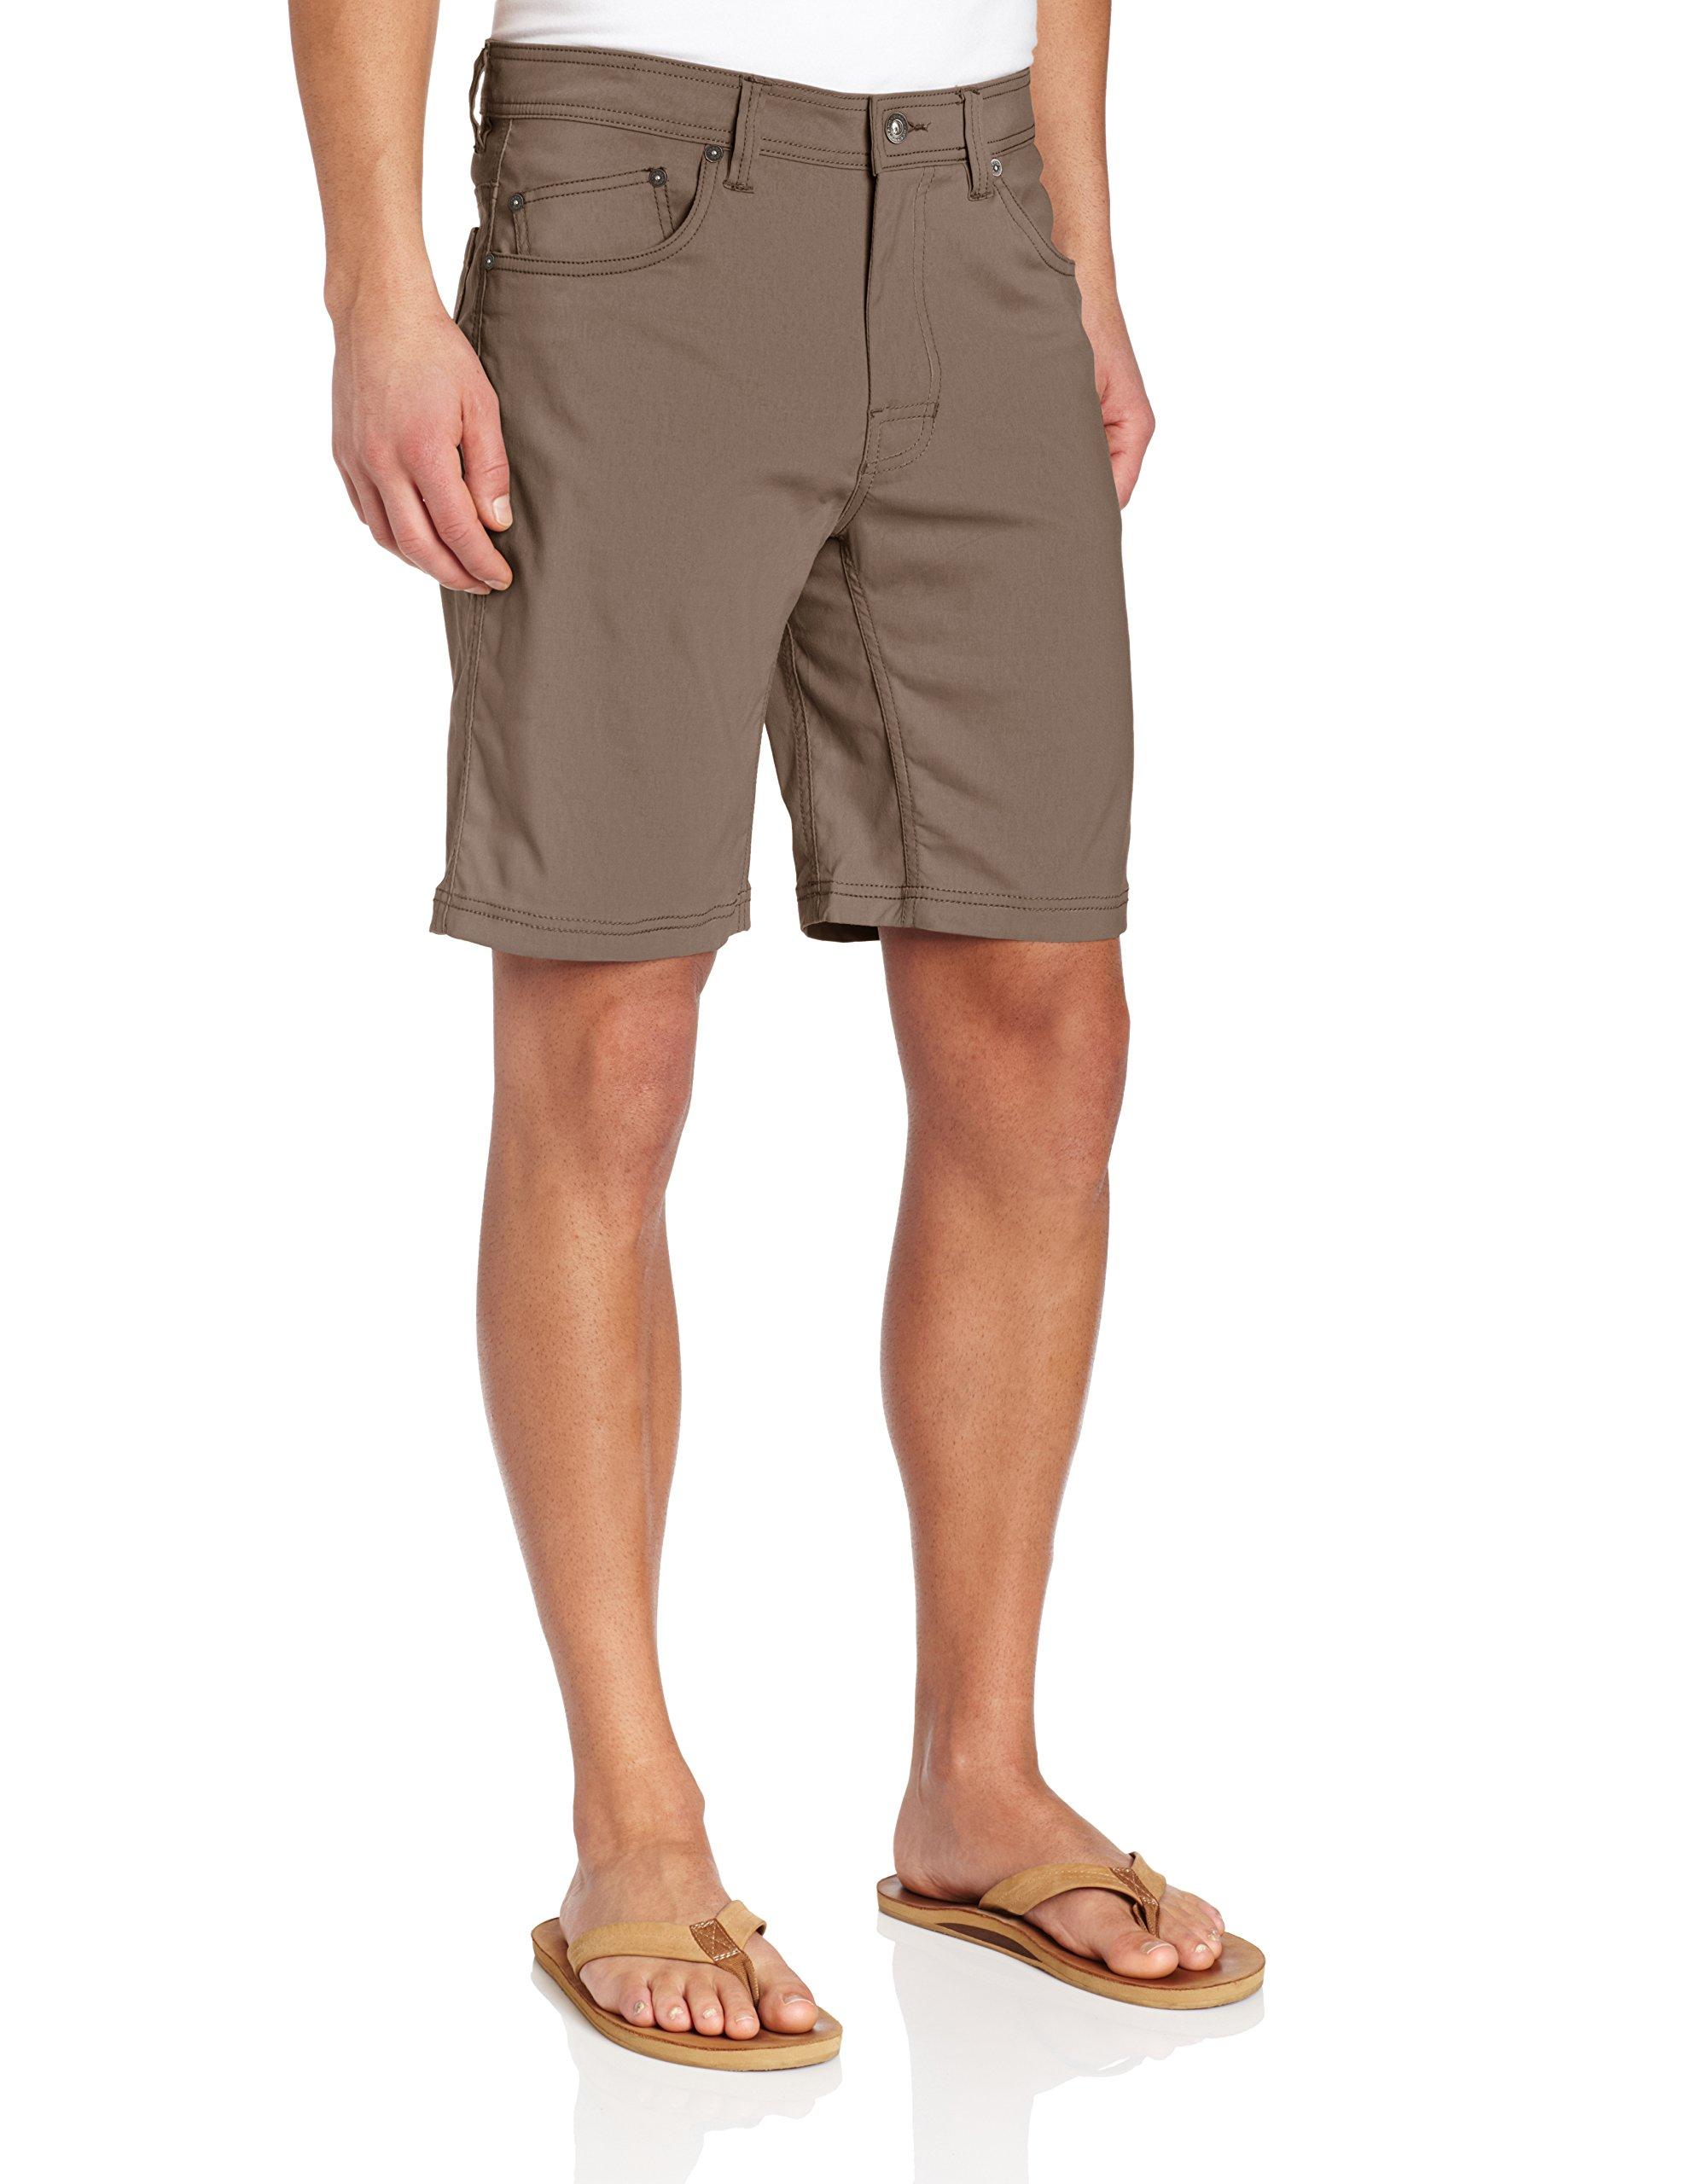 prAna Men's Brion Shorts, Mud, 28W 09L